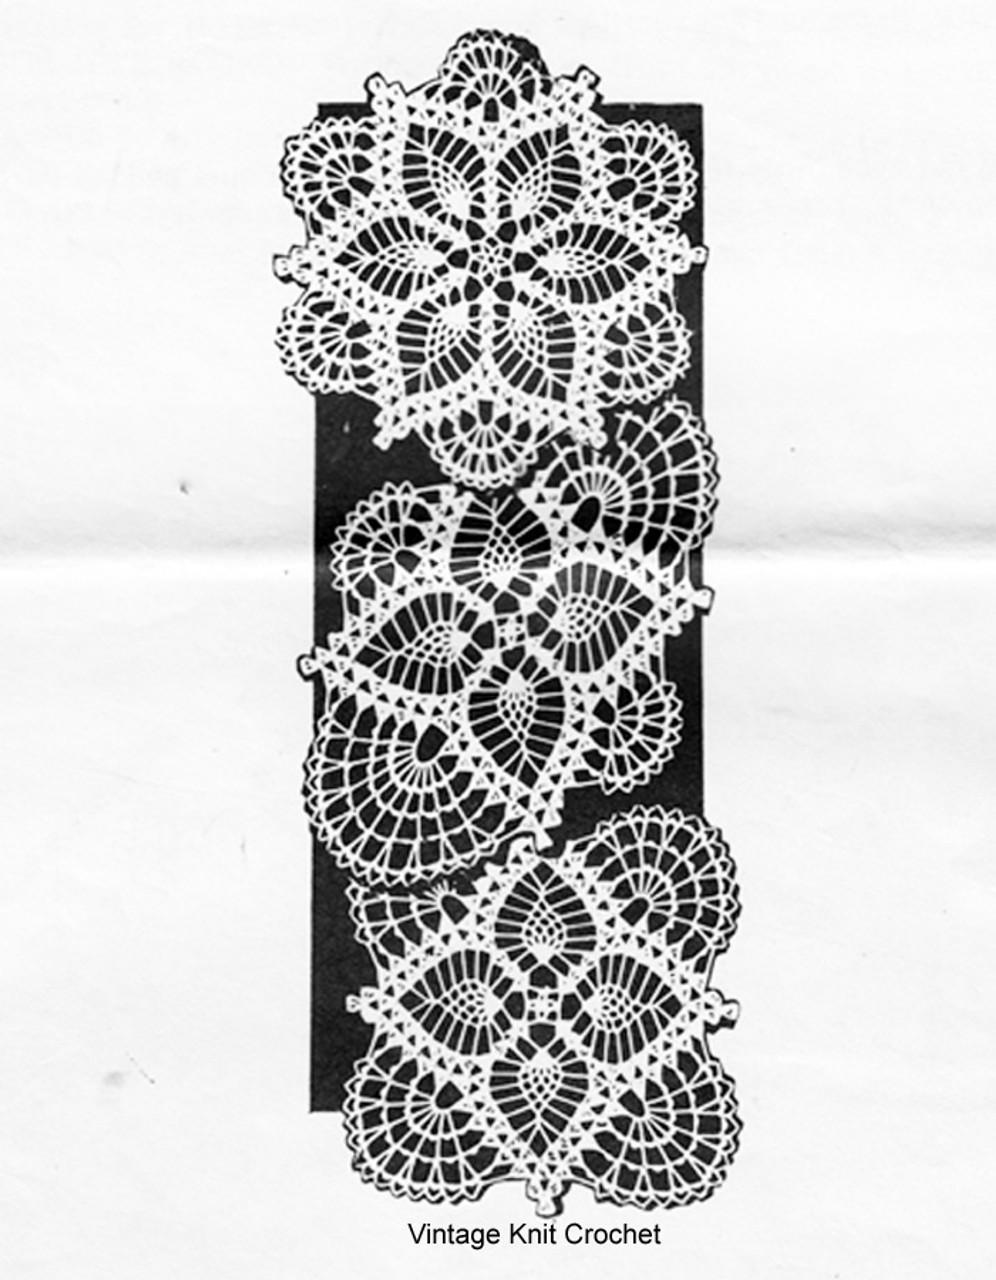 Crochet Square Pineapple Doily Pattern, Design 742